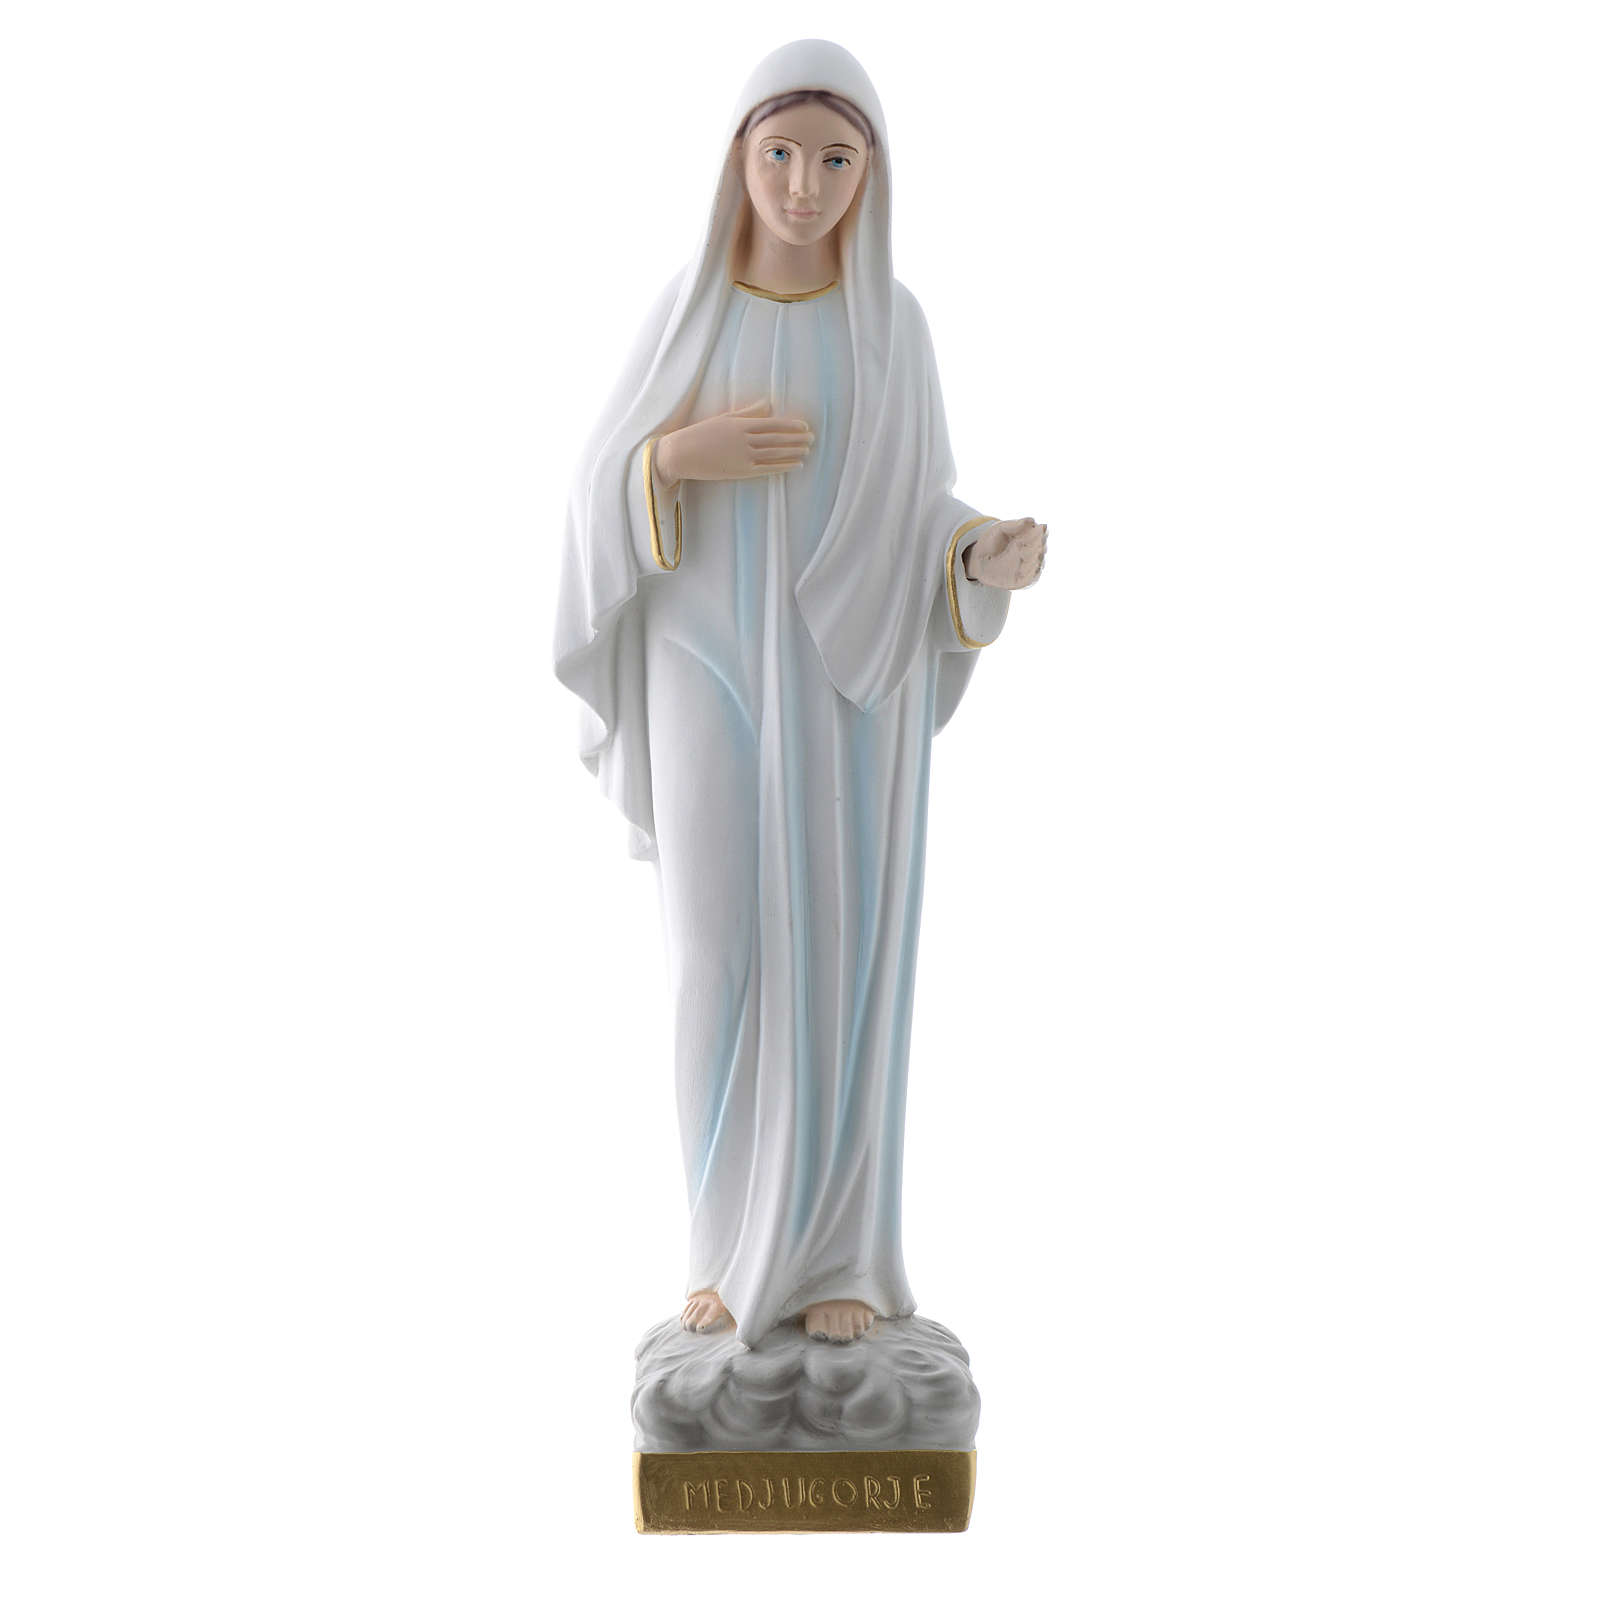 Estatua Nuestra Señora de Medjugorje 30cm. yeso 4